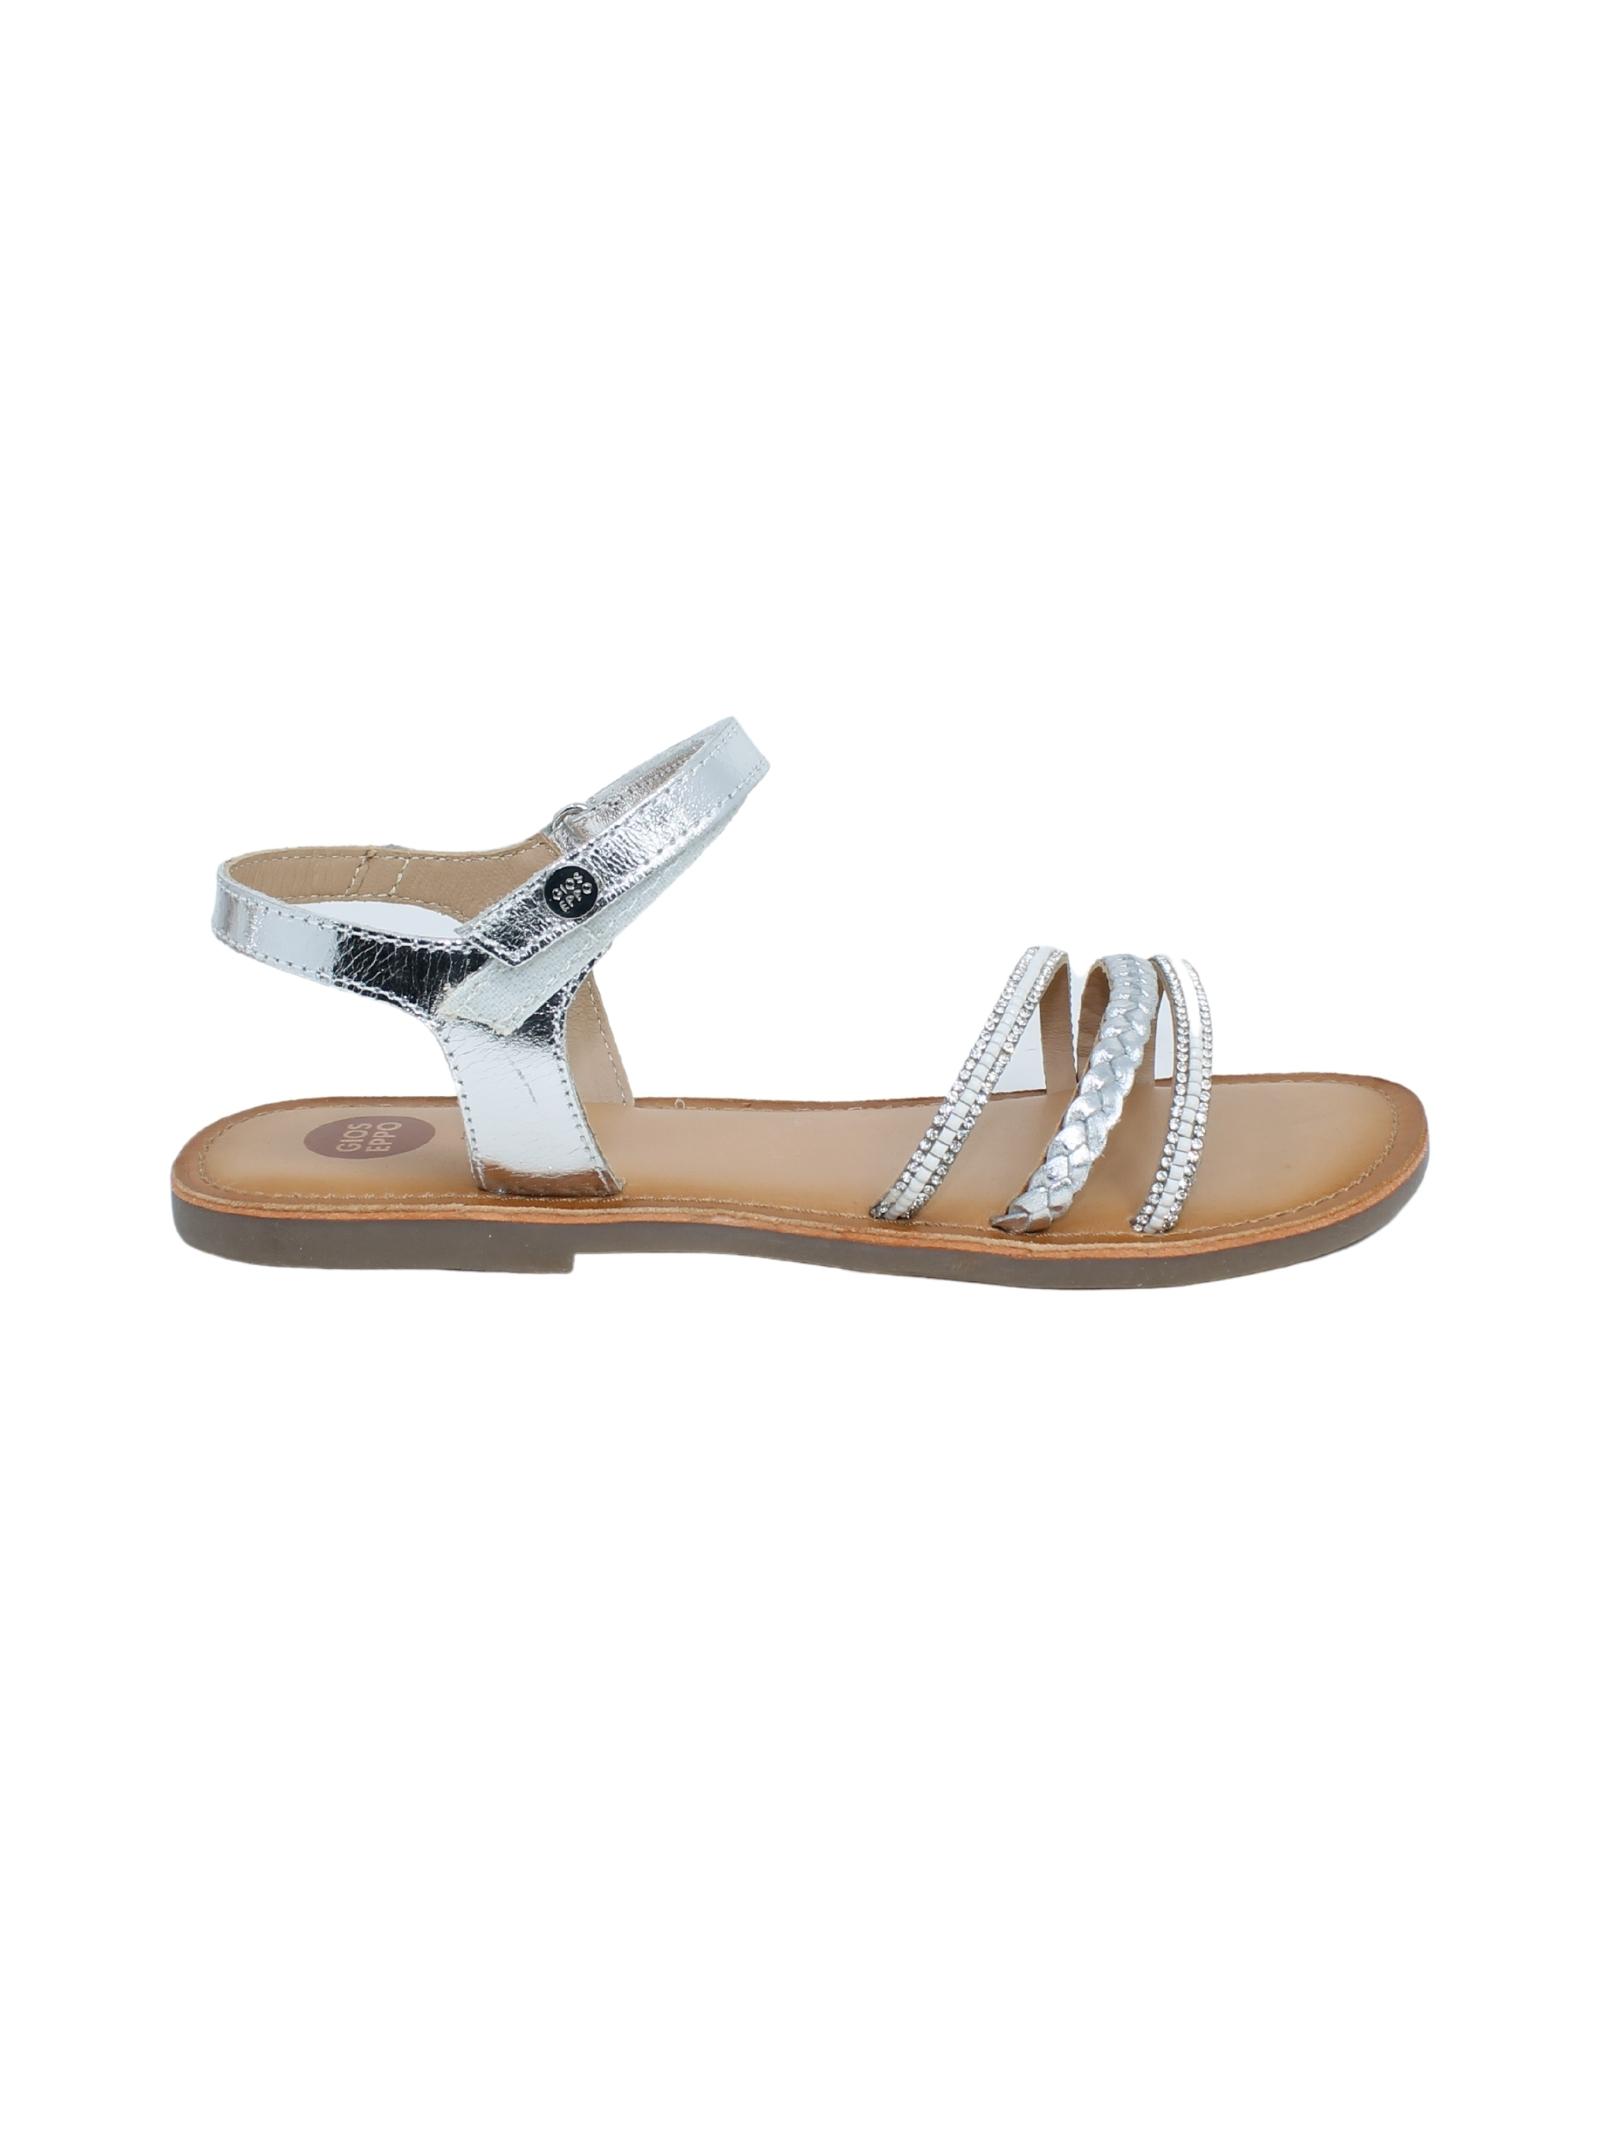 GIOSEPPO KIDS | Sandals | 62988ARGENTO